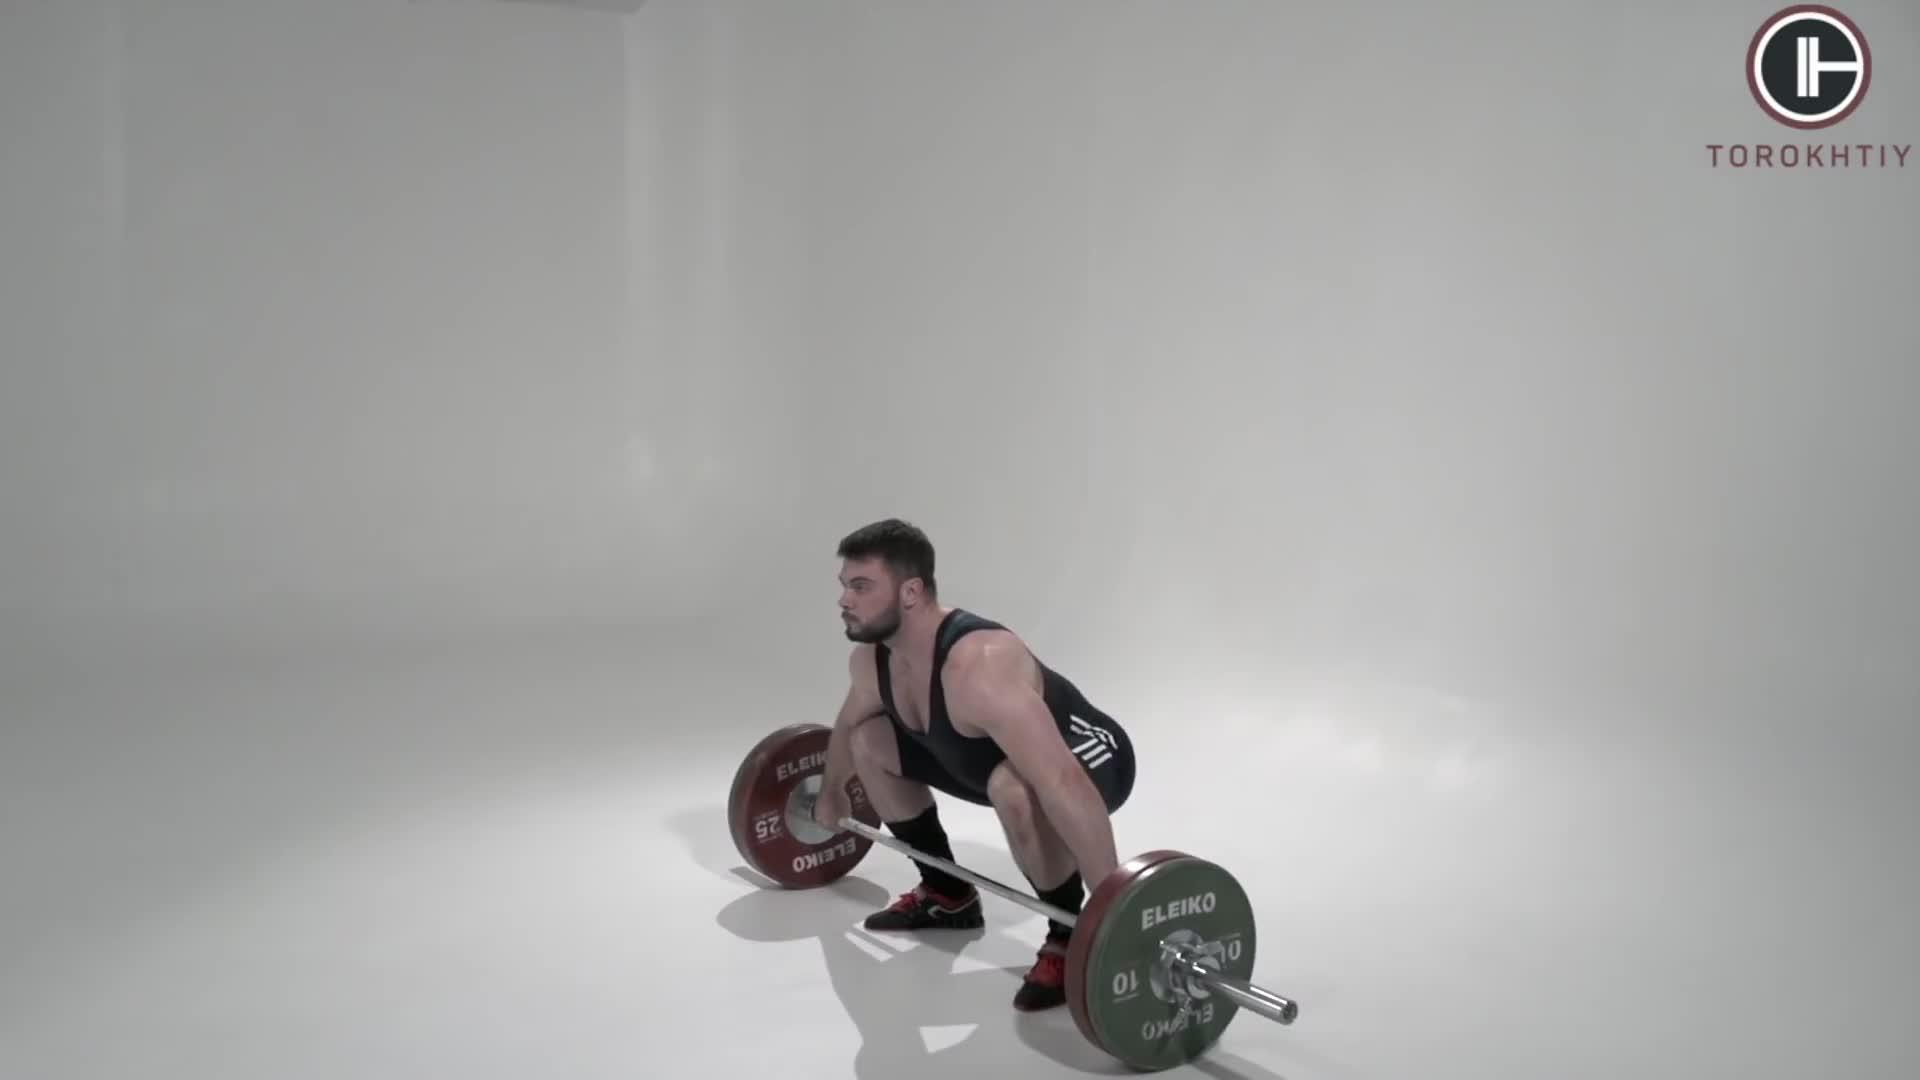 NURUDINOV Ruslan, TALAKHADZE Lasha, crossfit, hang snatch, jasop khalipa, katrin thorisdottip, lifting, noah ohlsen, olympic, power snatch, snatch, torokhtiy, weightlifting, Power SNATCH / weightlifting & crossfit GIFs